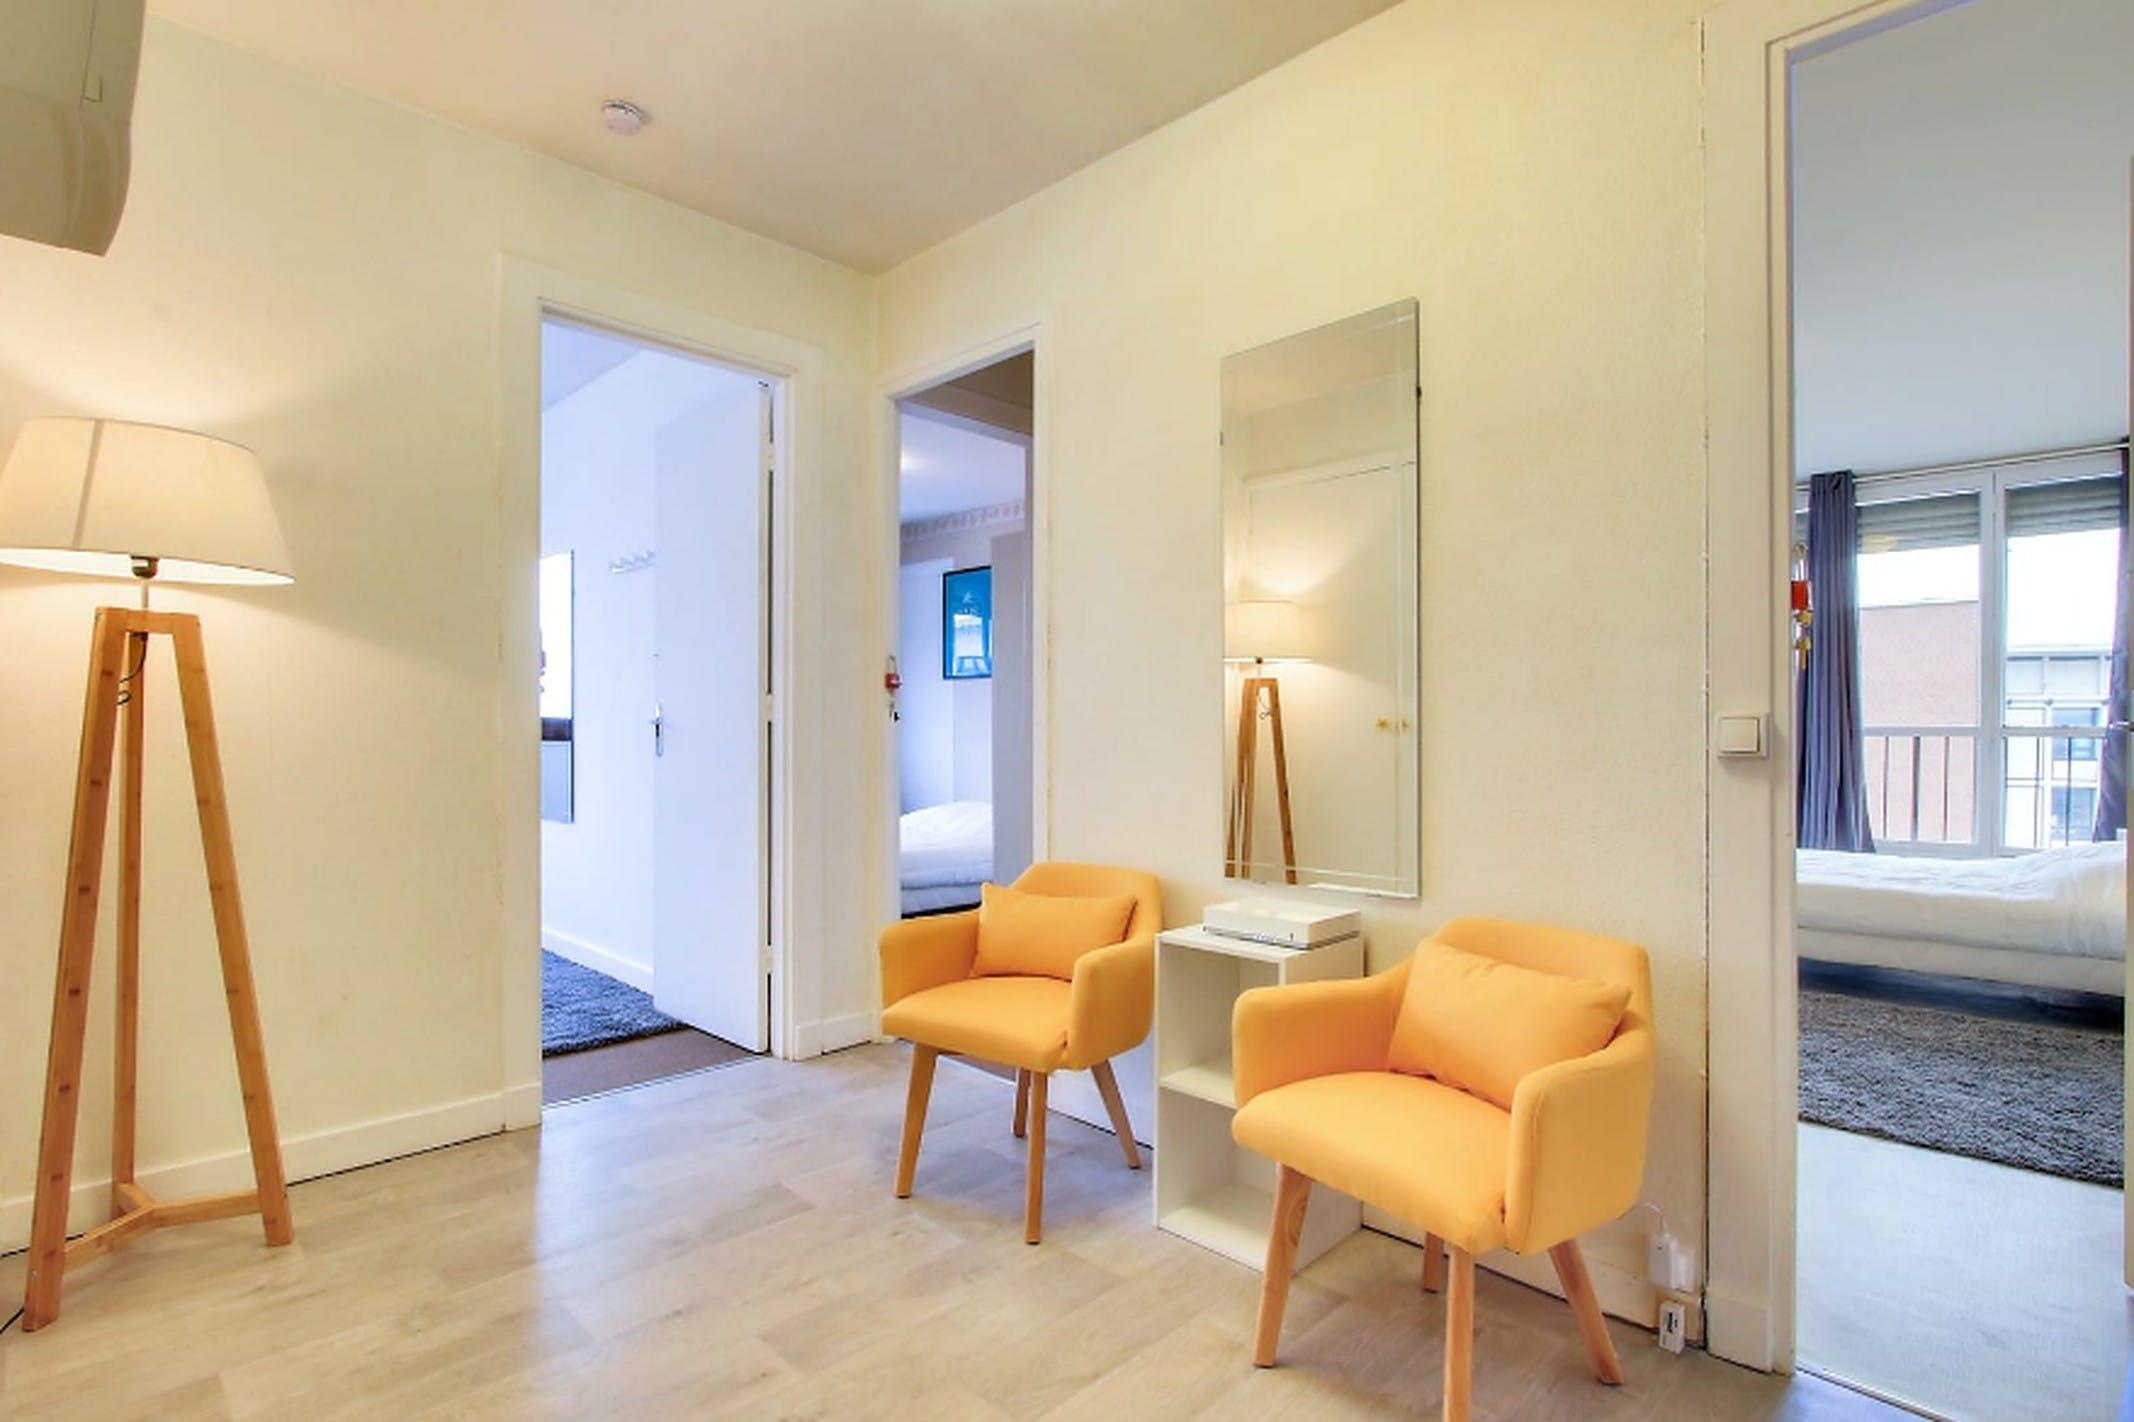 3 Residents | Vieux Ville | Stunning Cozy Apt.